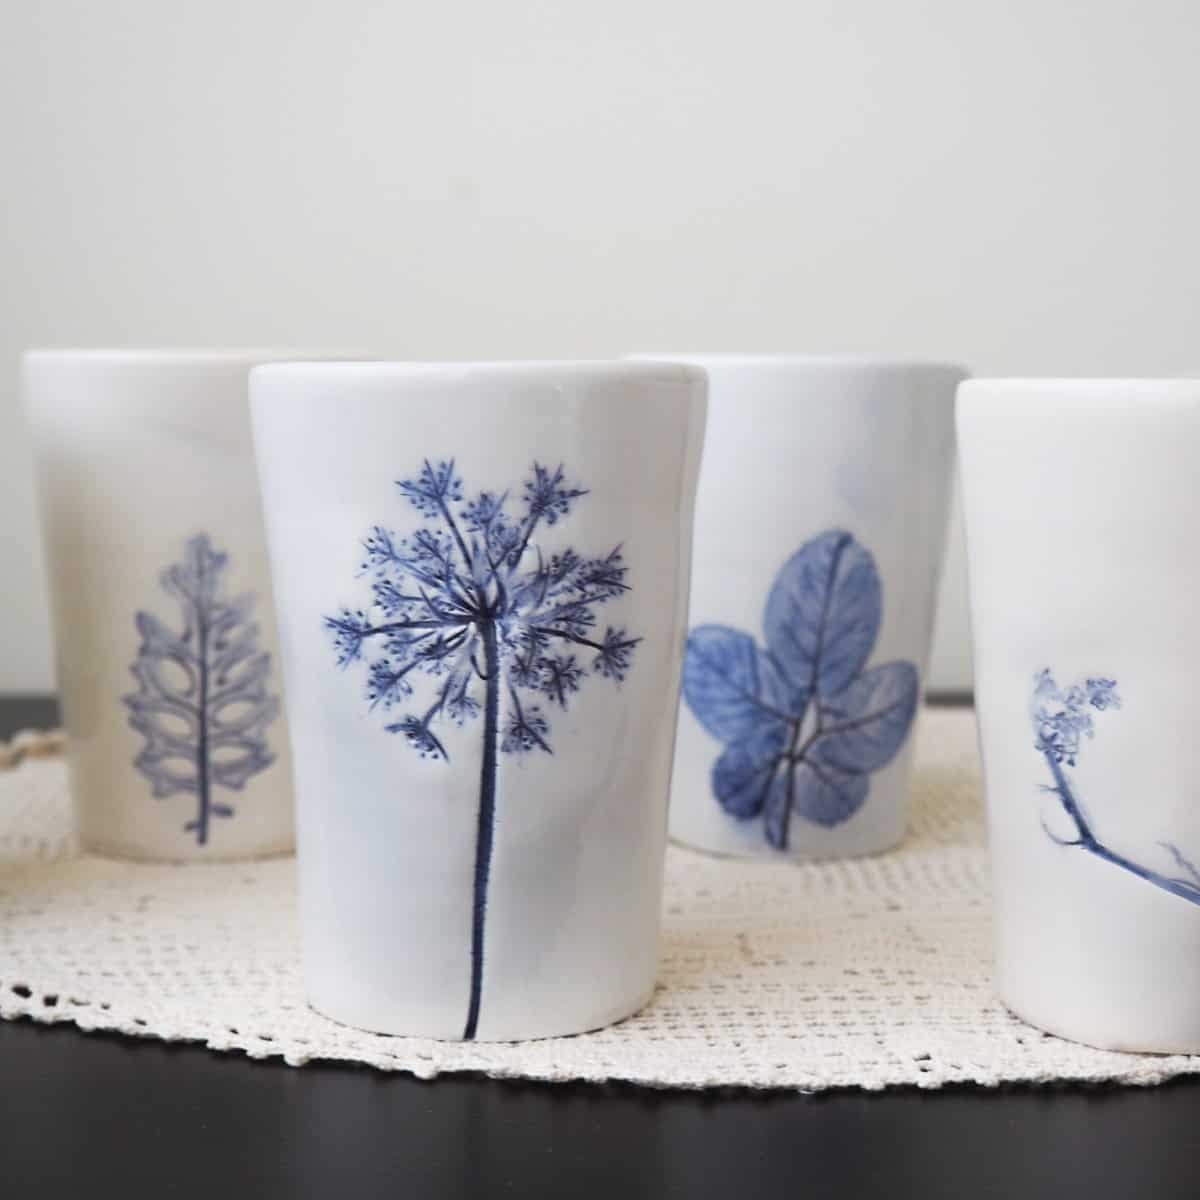 bicchieri ceramica bianchi e blu con foglie e fiori